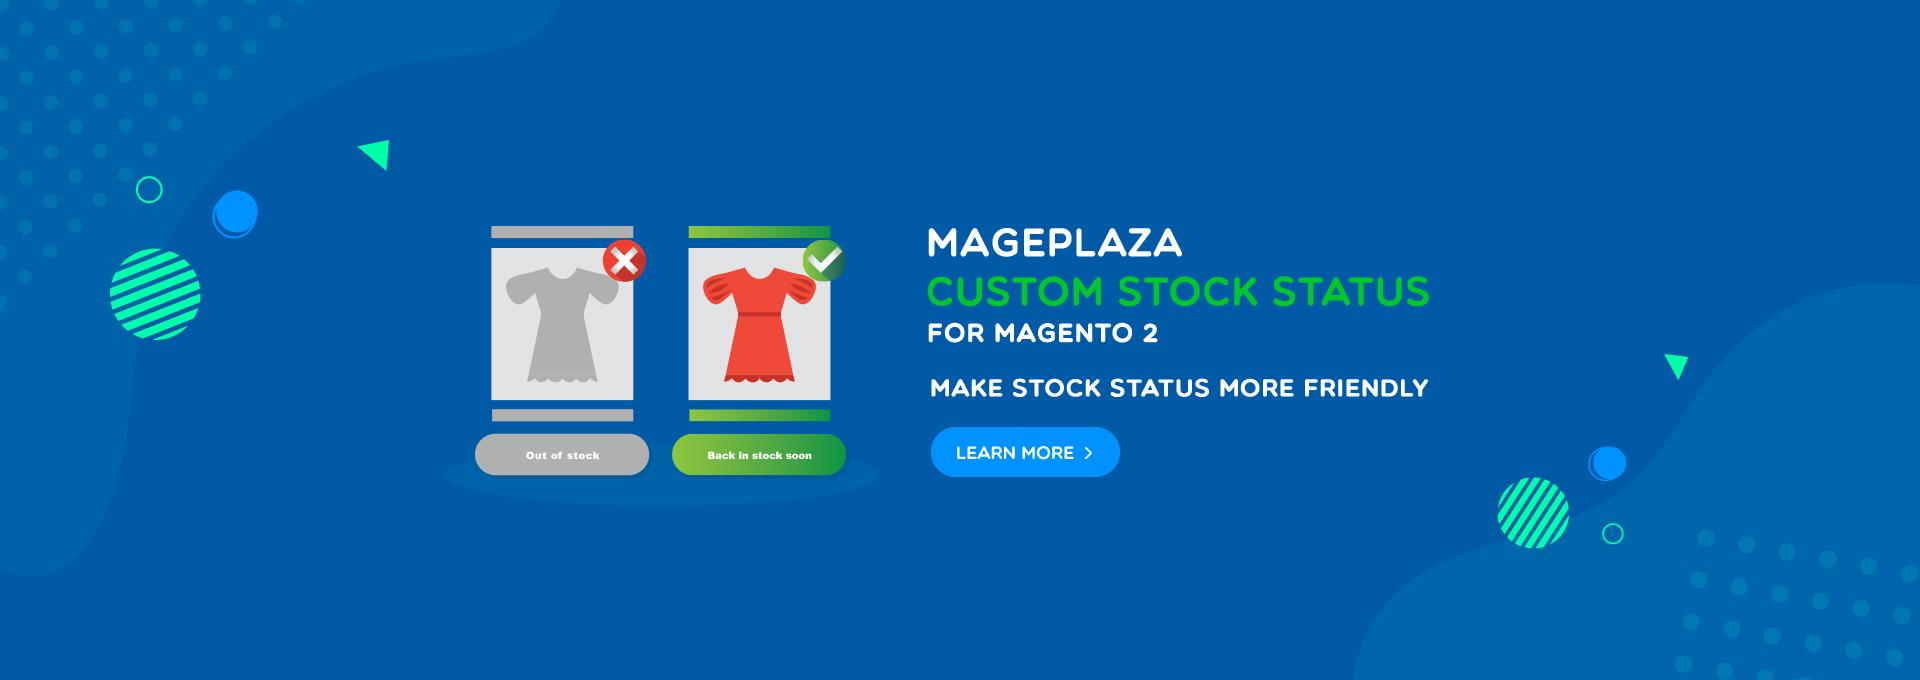 magento 2 custom stock status